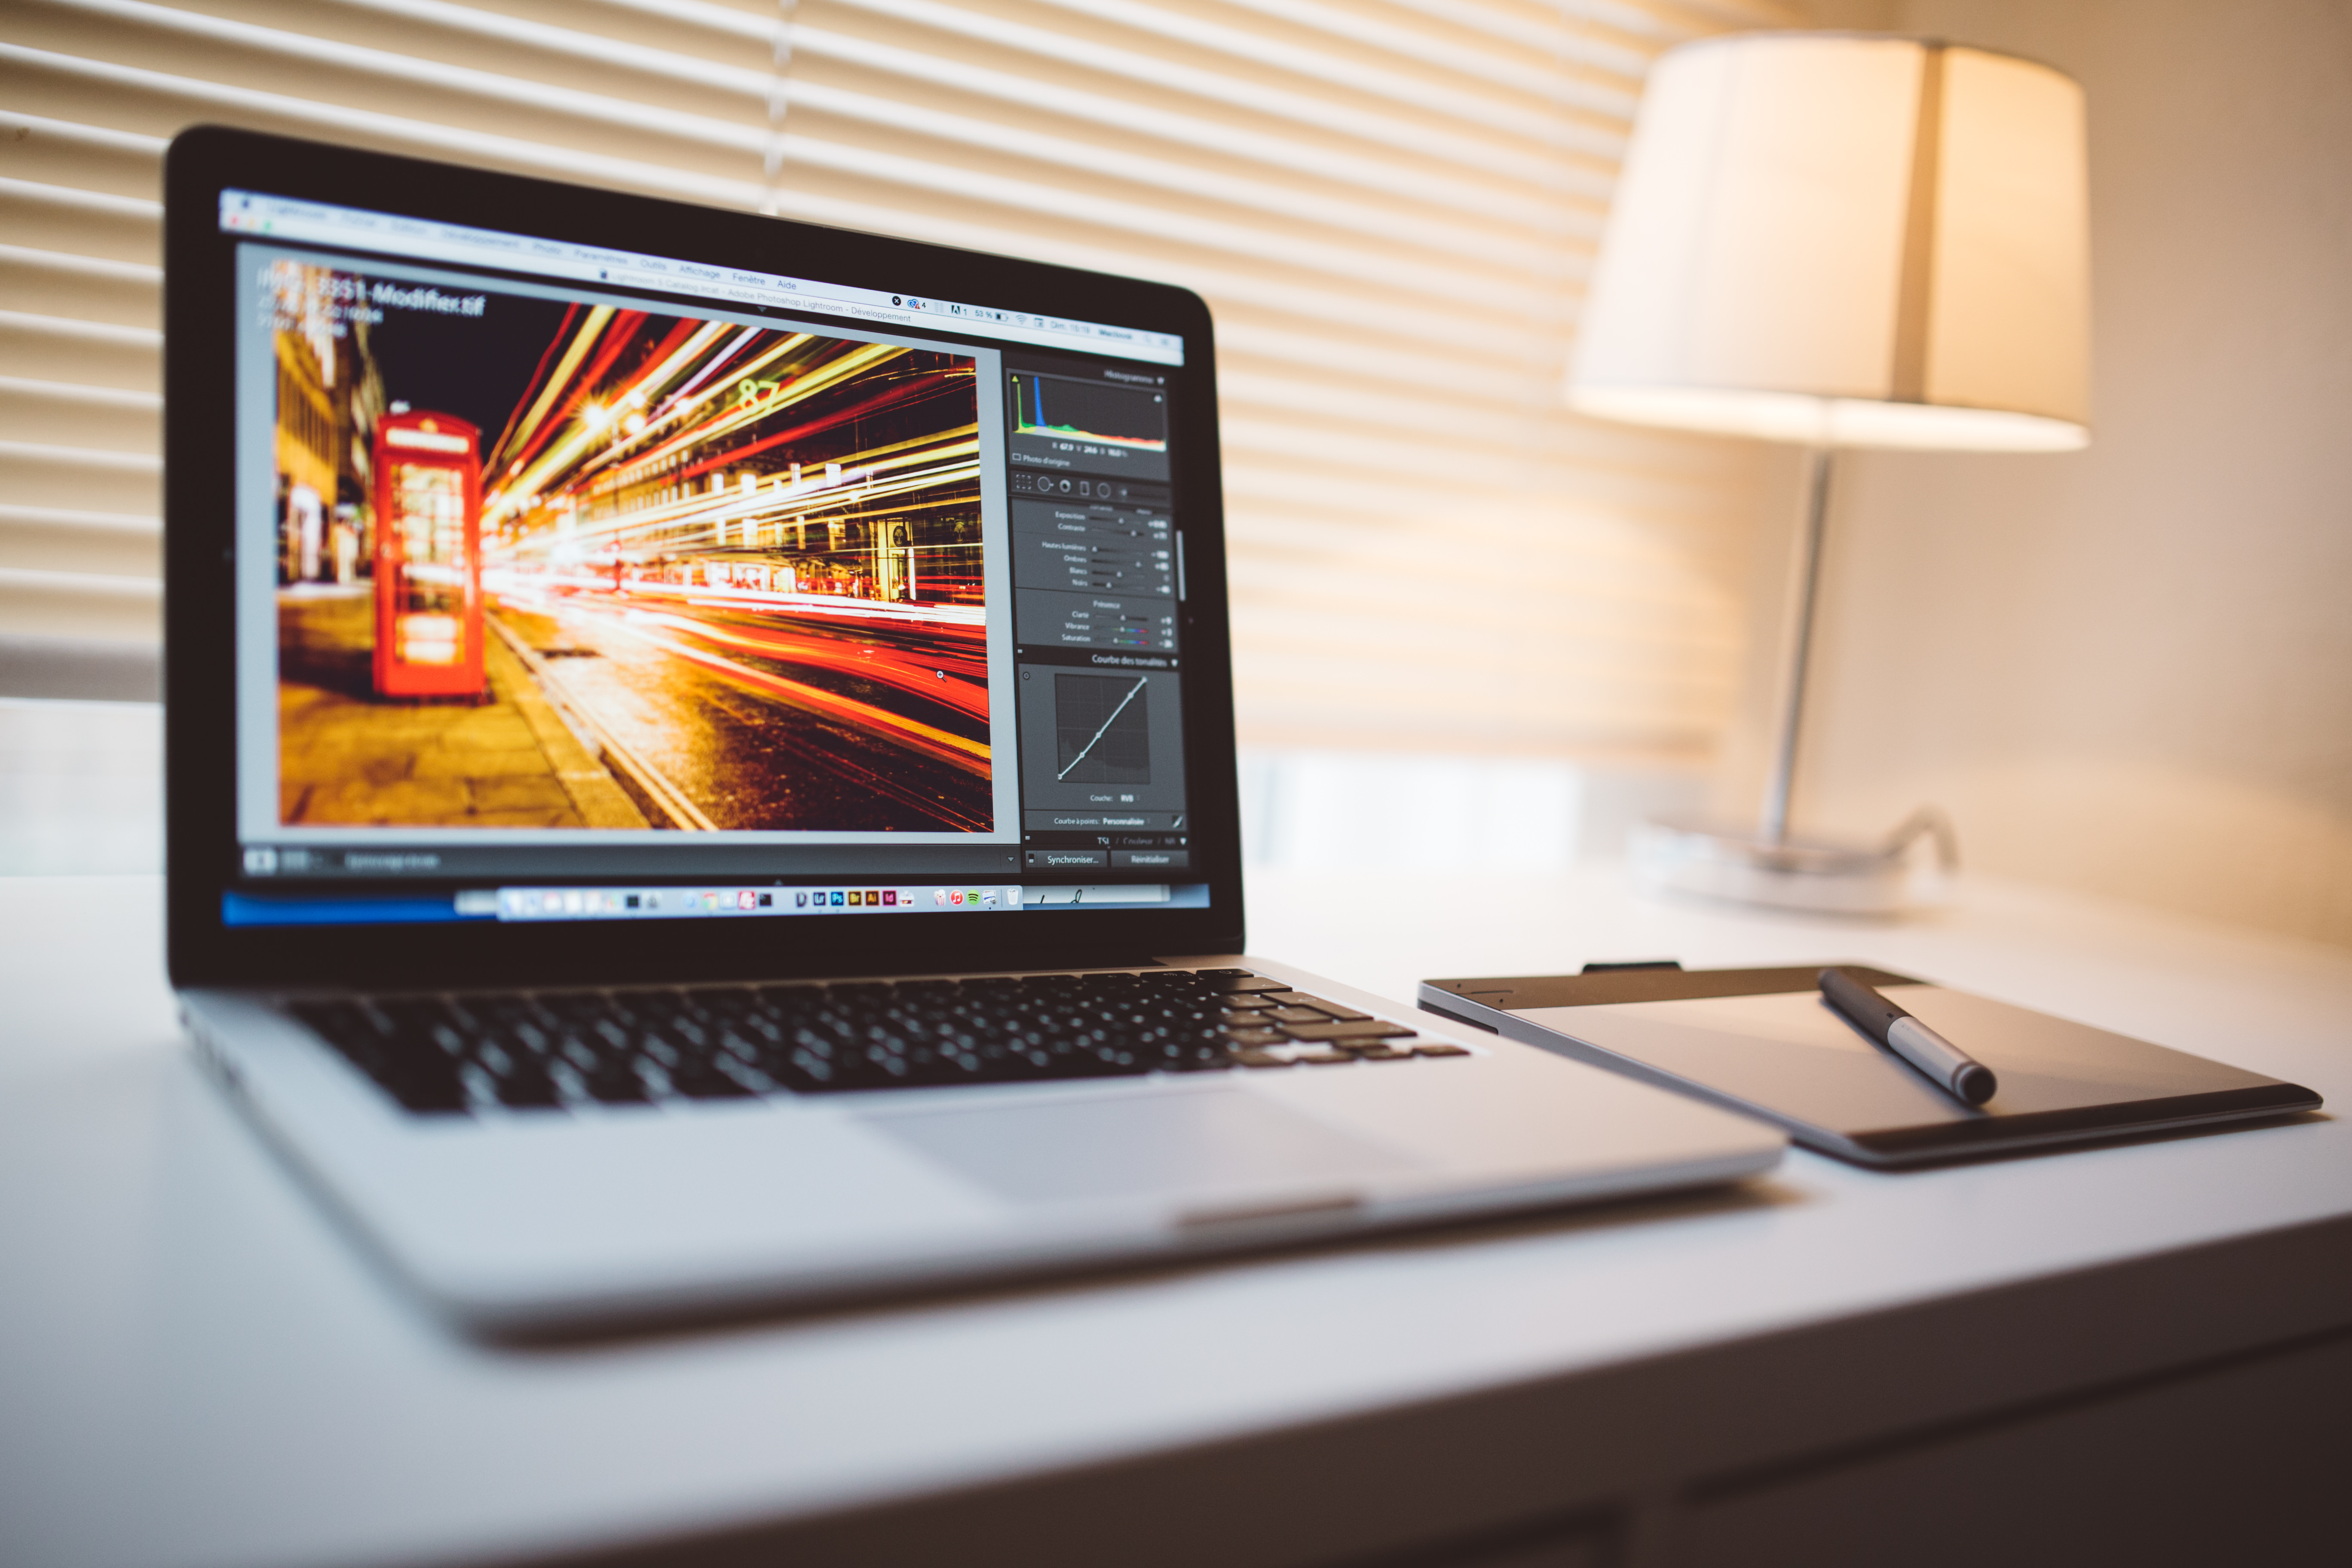 tablet shortcuts personalize photoshop